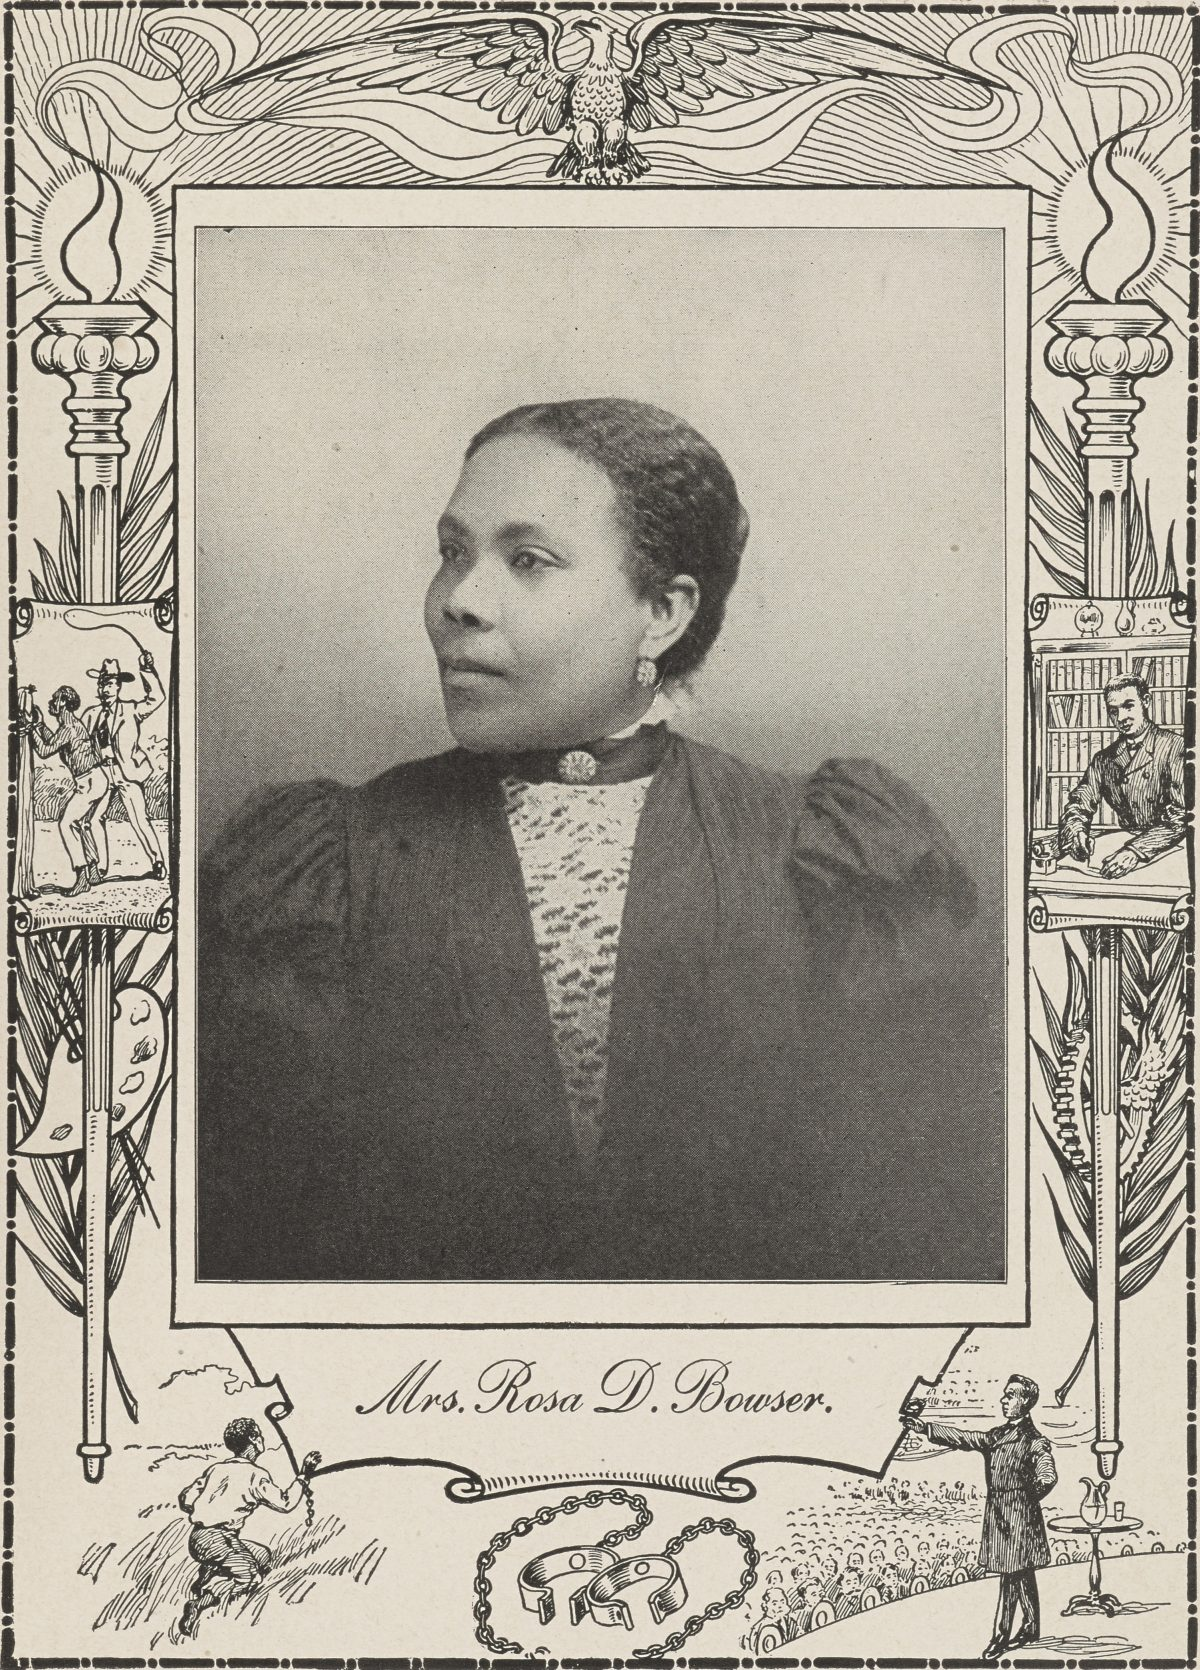 Mrs. Rosa D. Bowser.